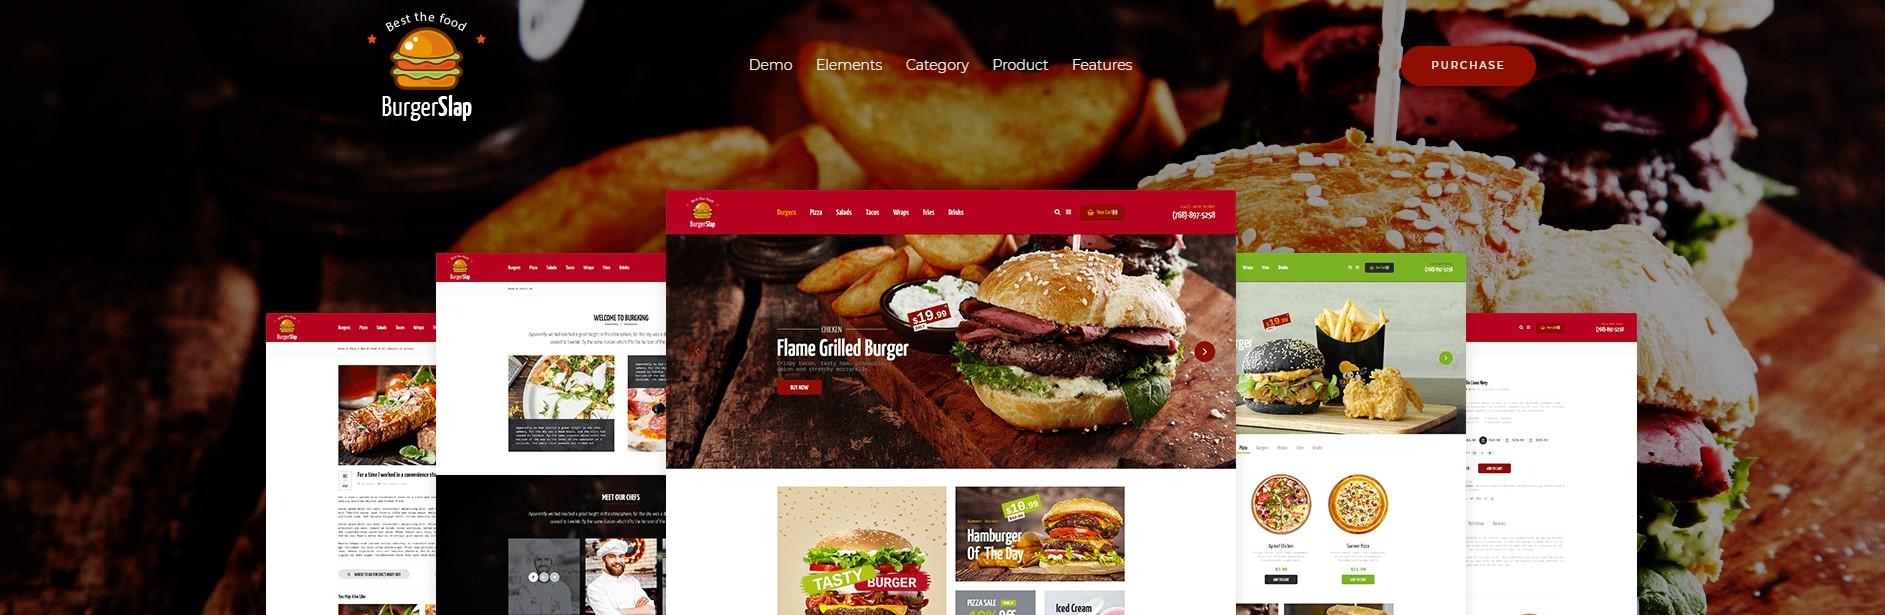 Burger Slap – Fast Food Restaurant WordPress Theme